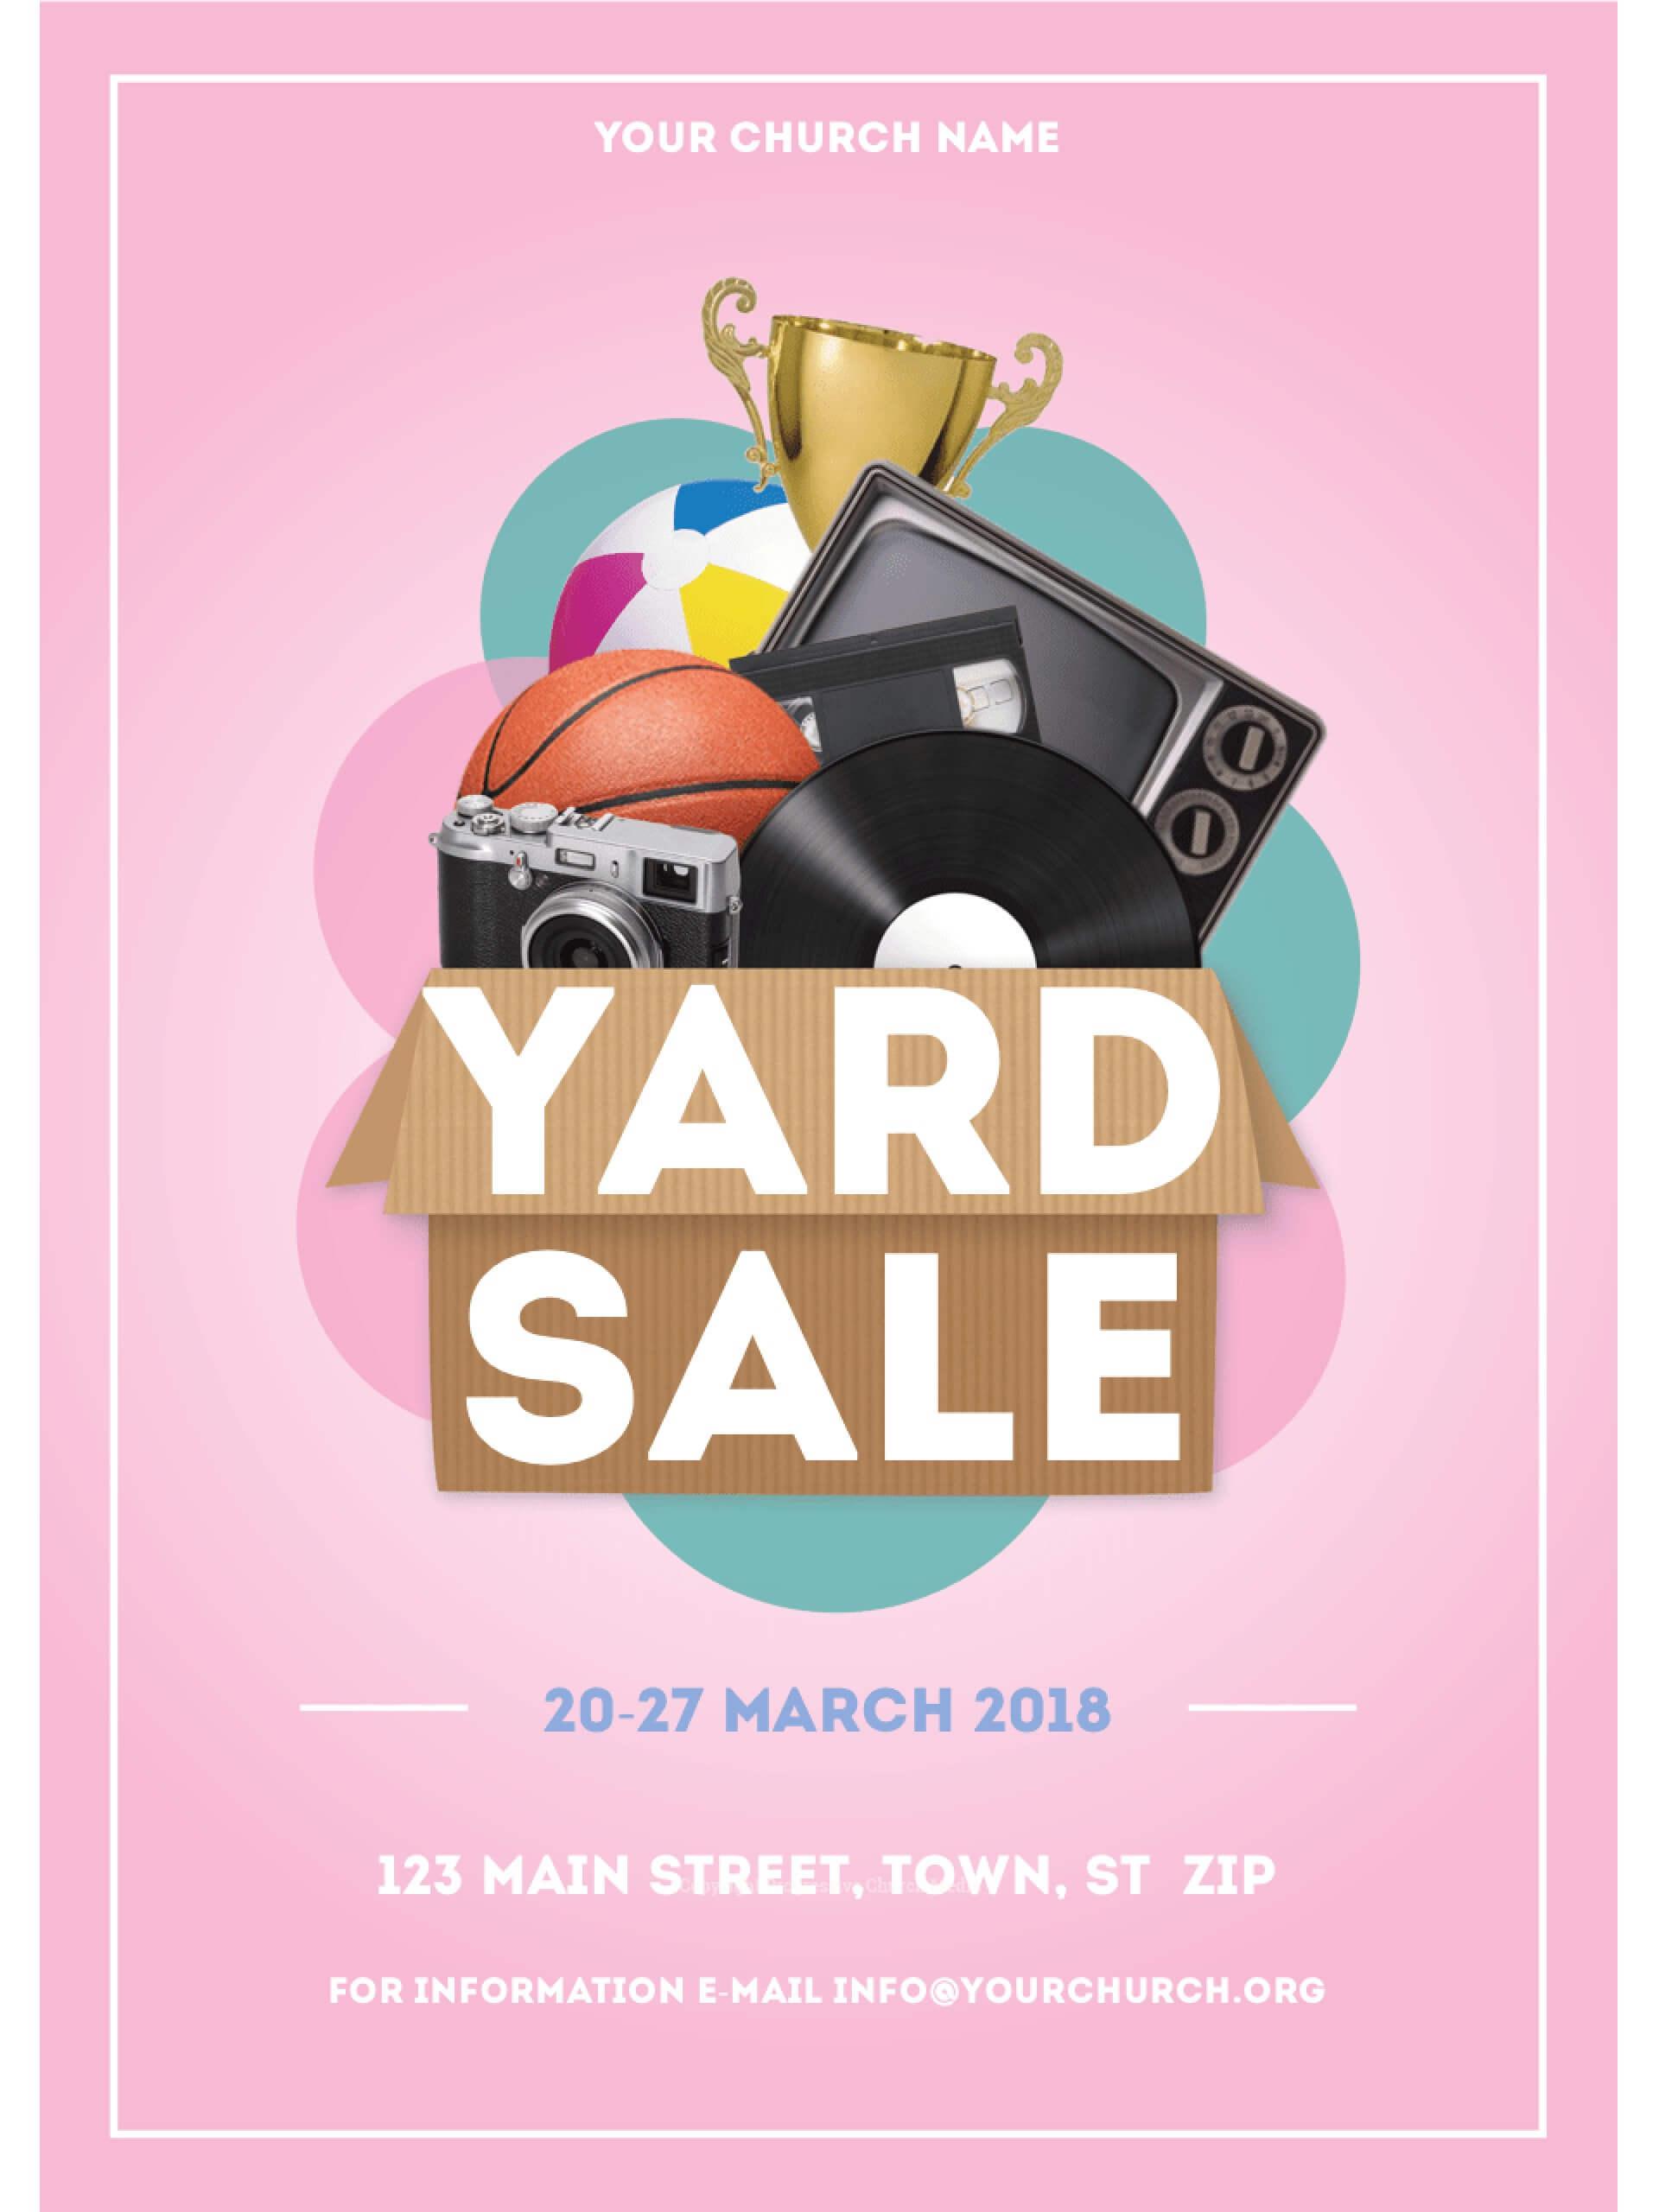 027 Garage Sale Flyer Template Word Yard1 1Fit9602C1280Ssl1 Throughout Garage Sale Flyer Template Word